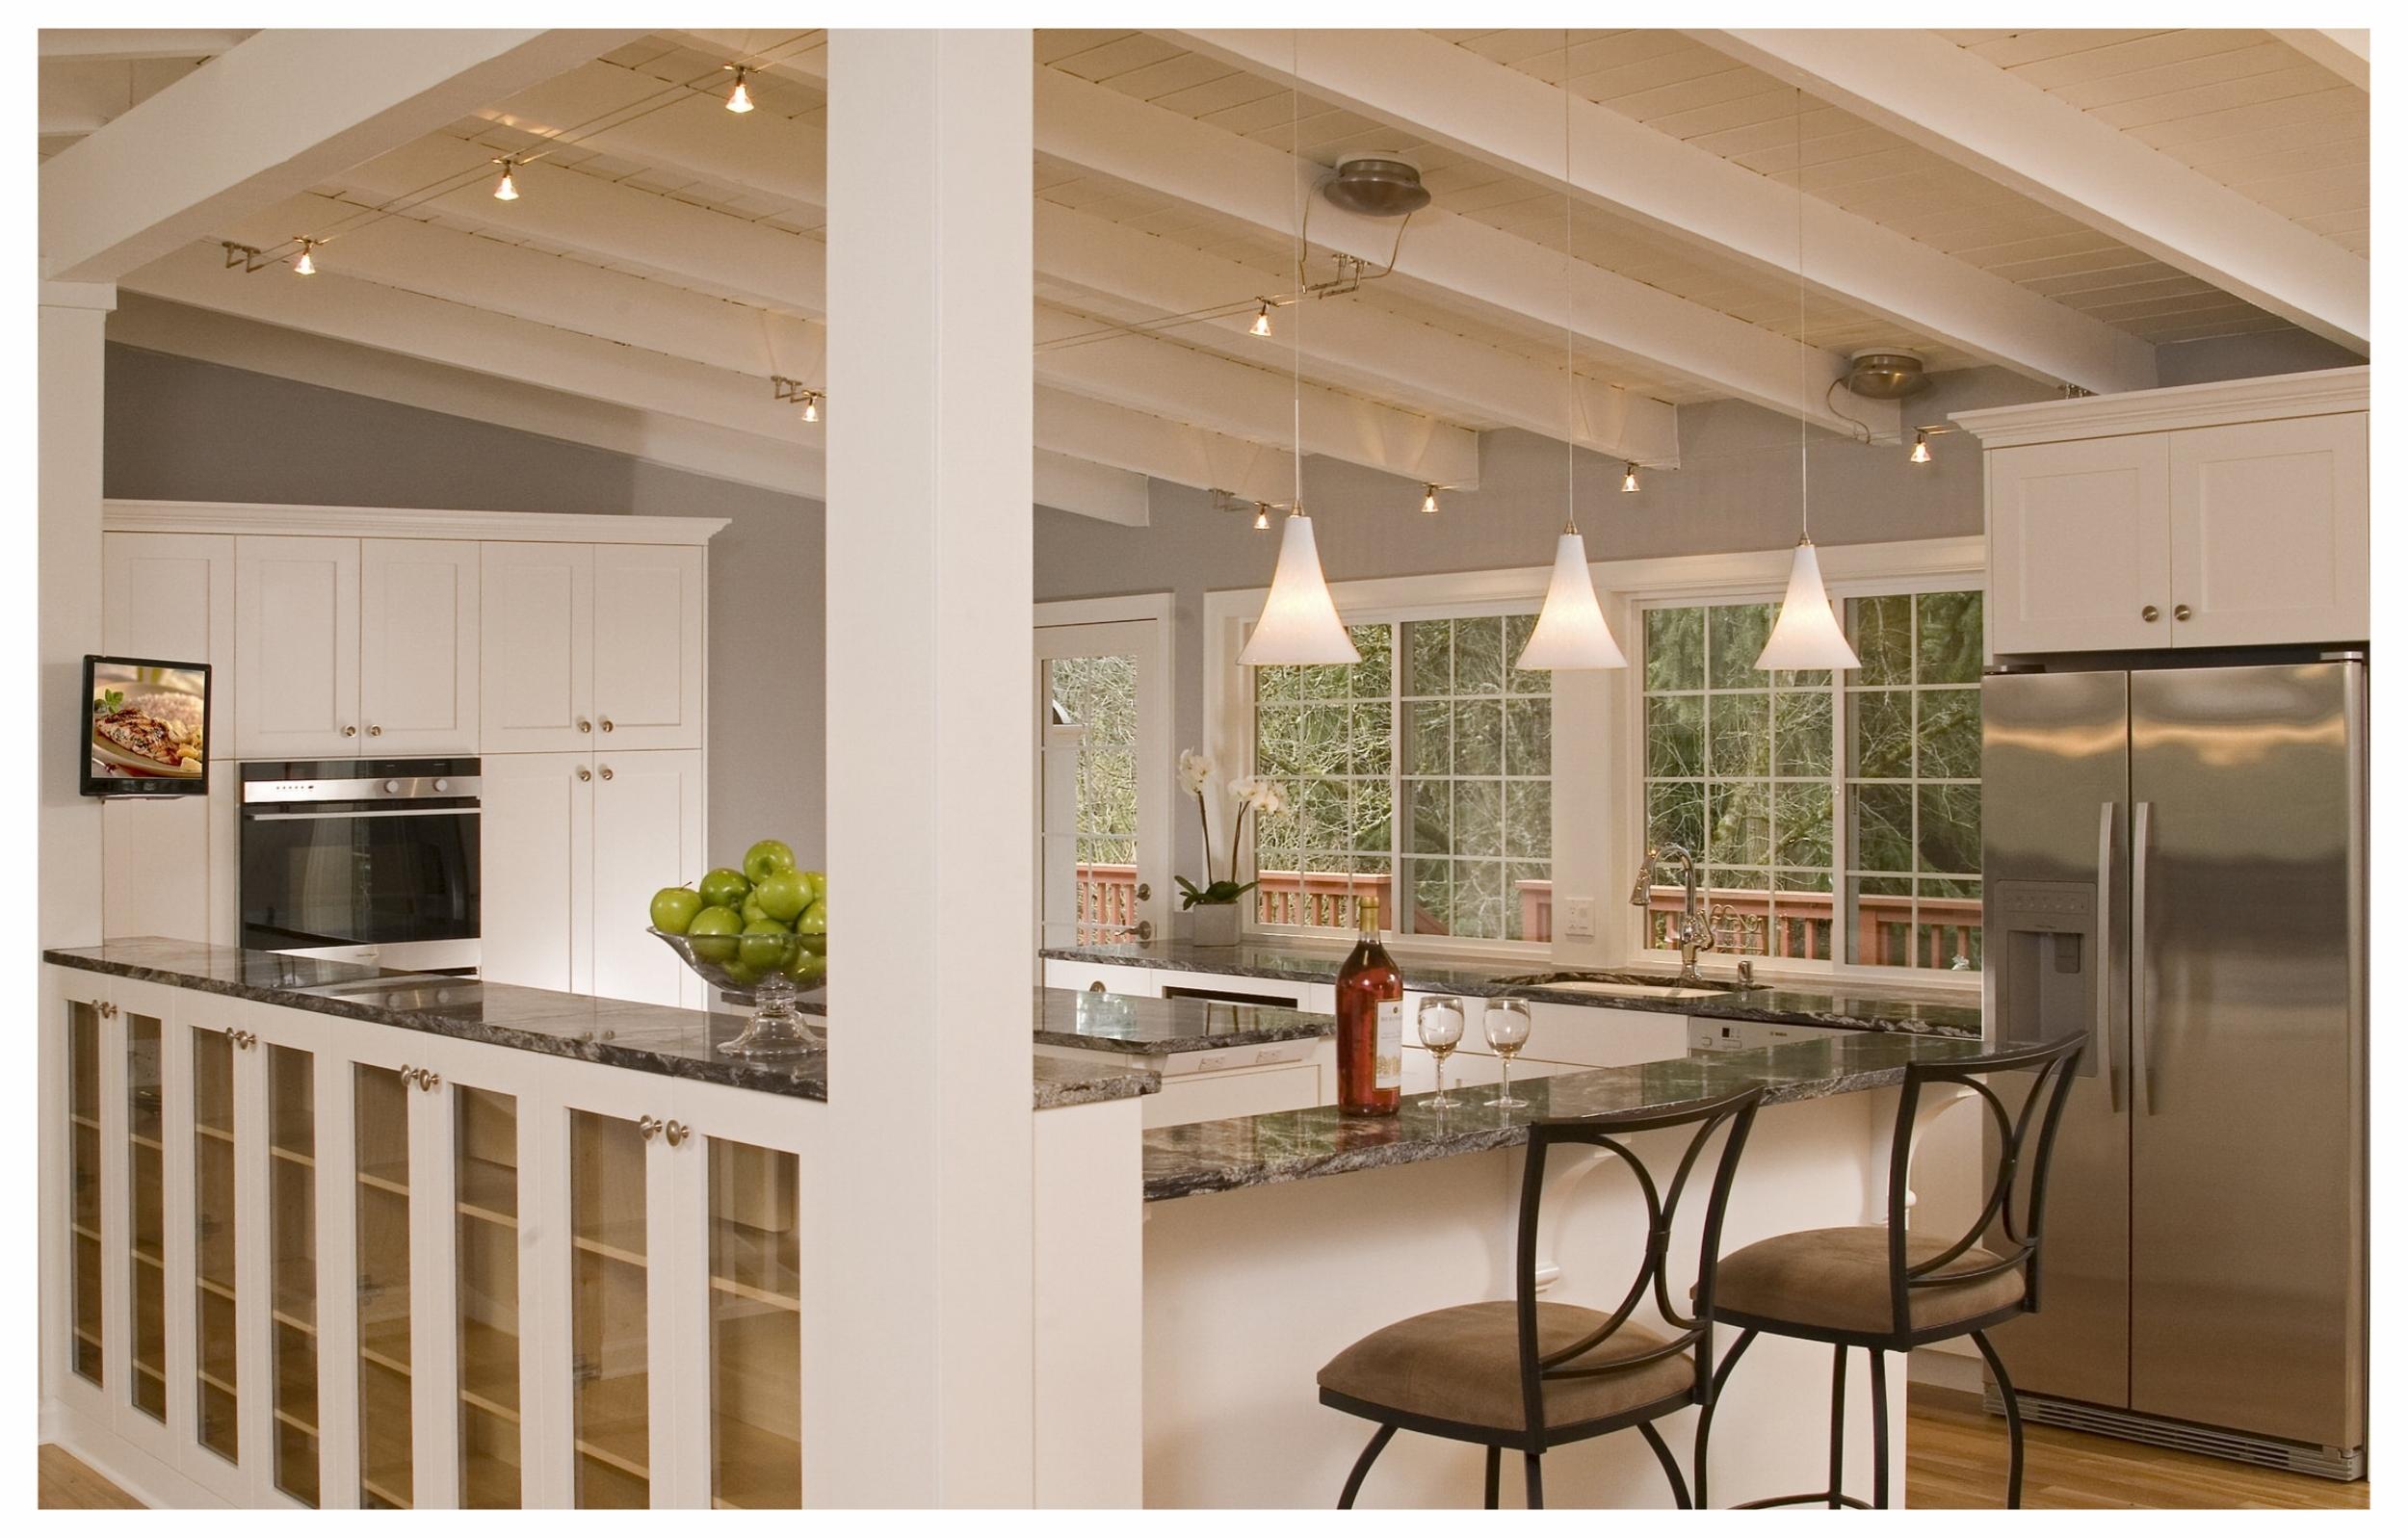 Bellevue Newport Hills Transitional Kitchen 1.jpg